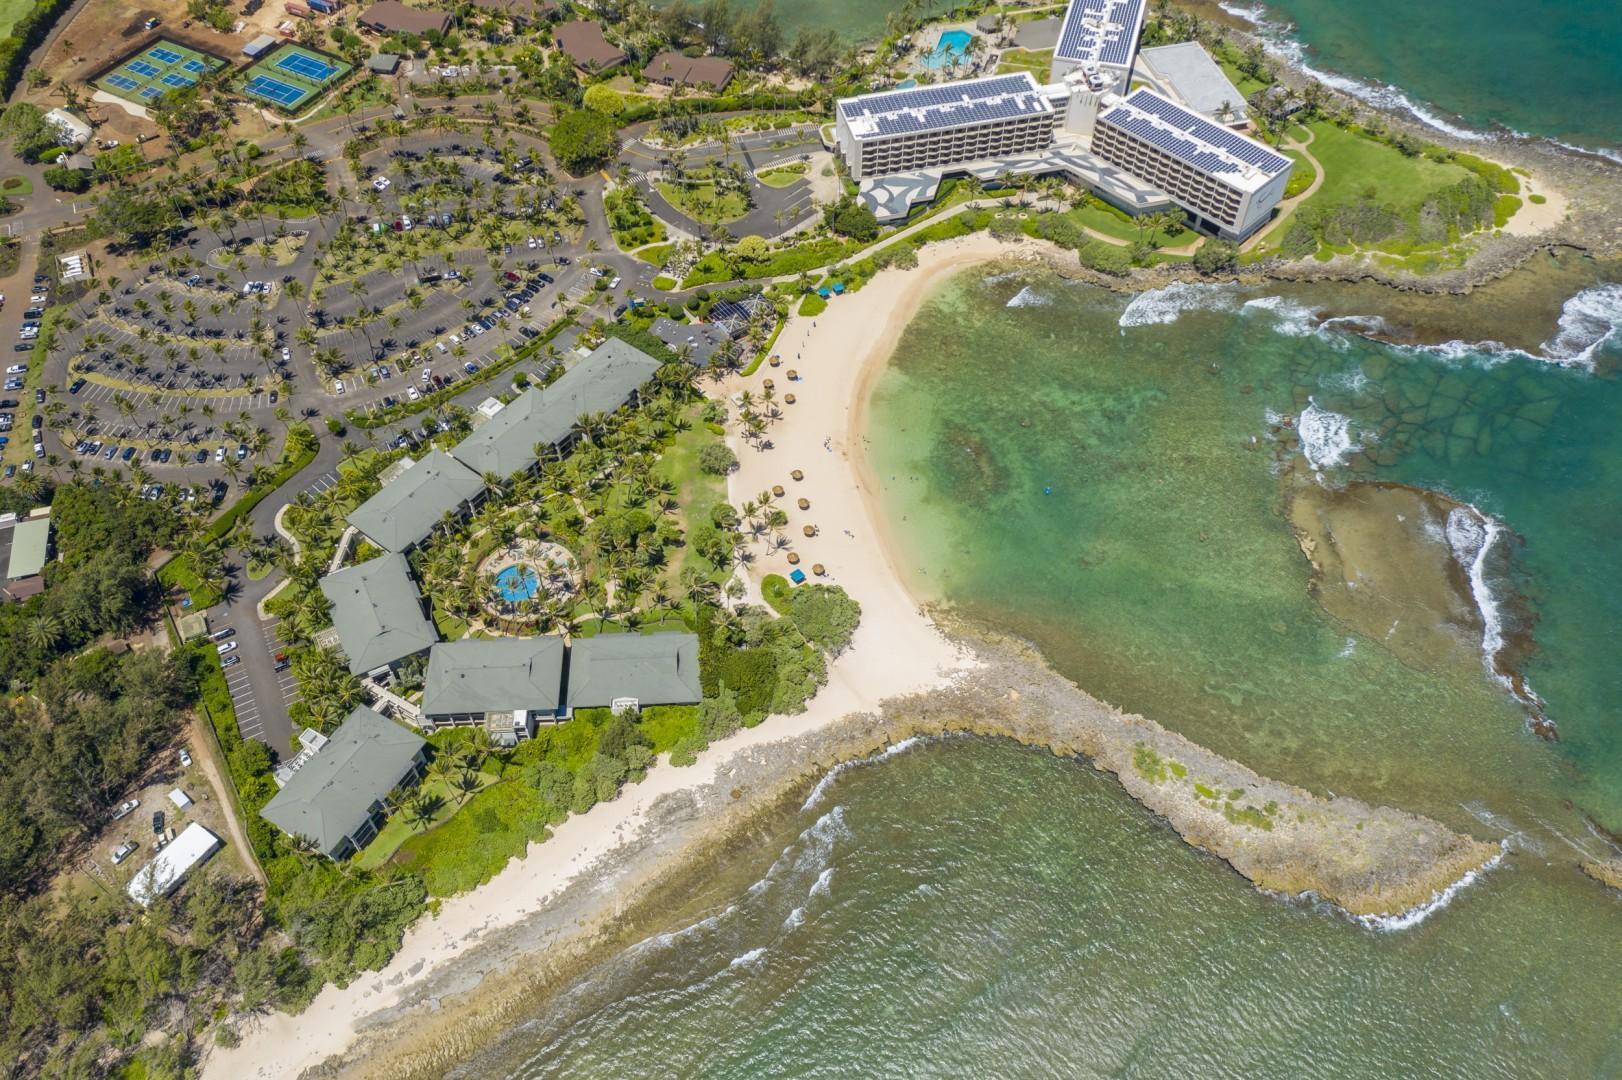 Aerial view of Ocean Villas